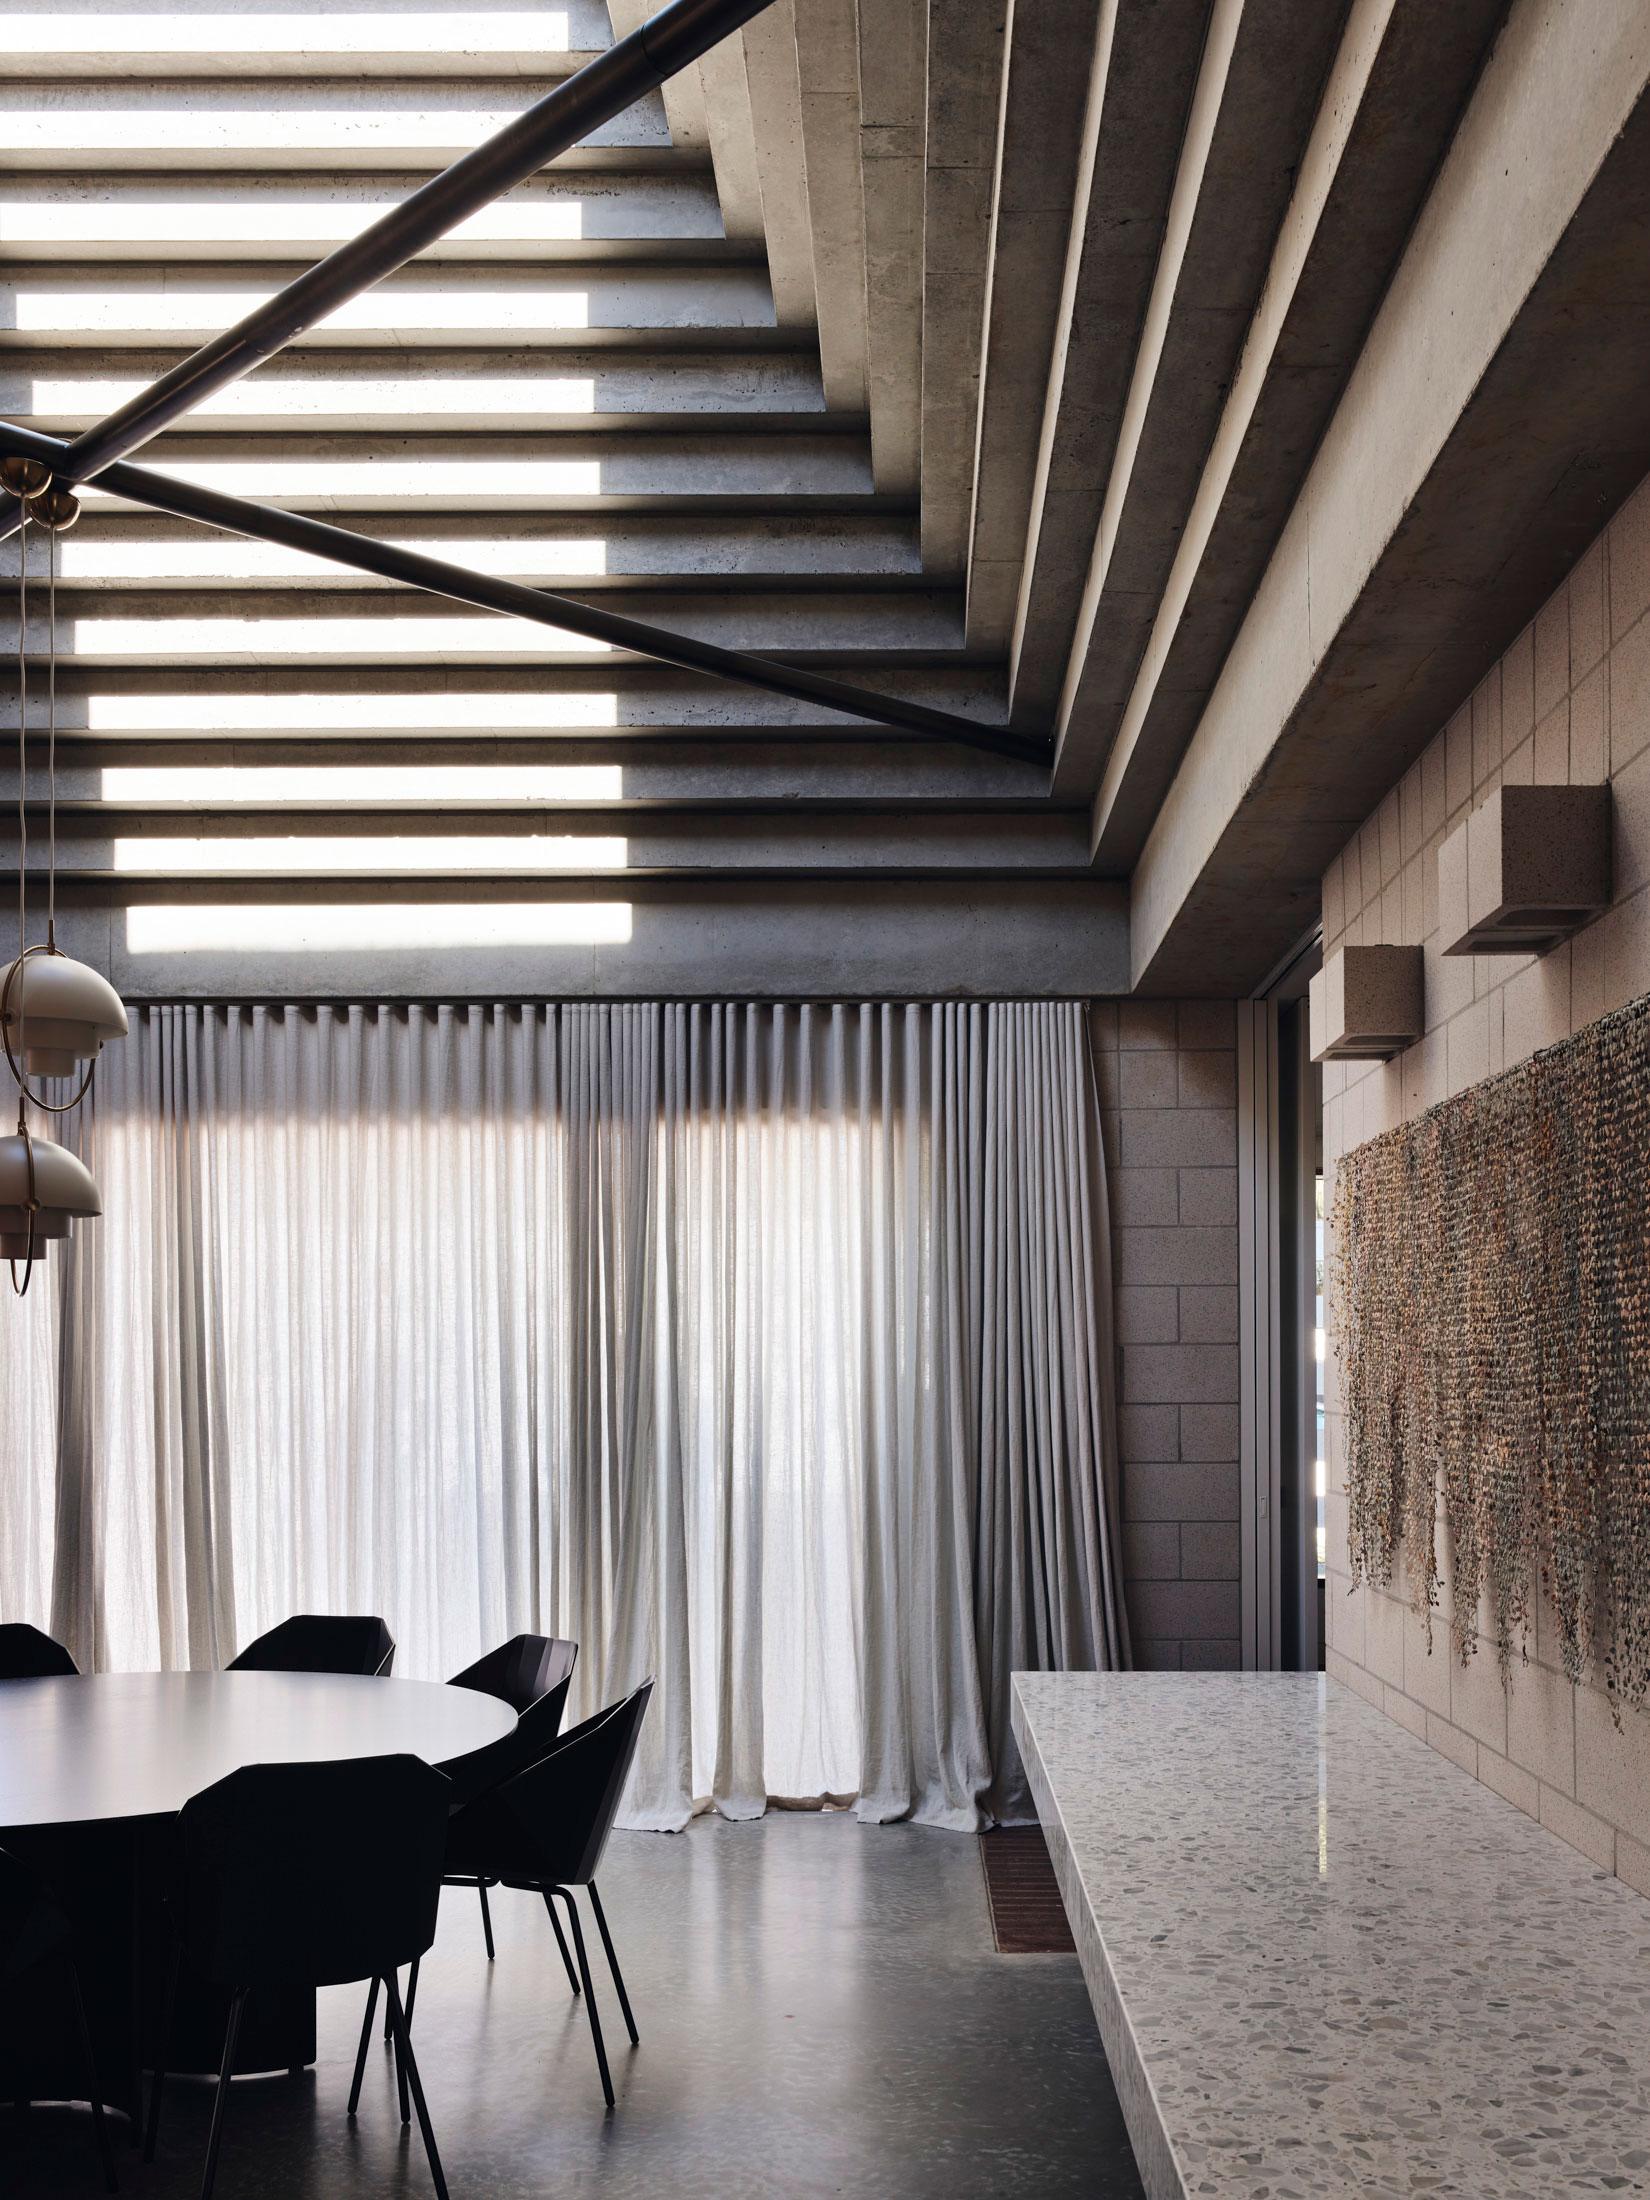 Architects Eat Bellows Beach House Flinders Masonry Architecture Photo Derek Swalwell Yellowtrace 26